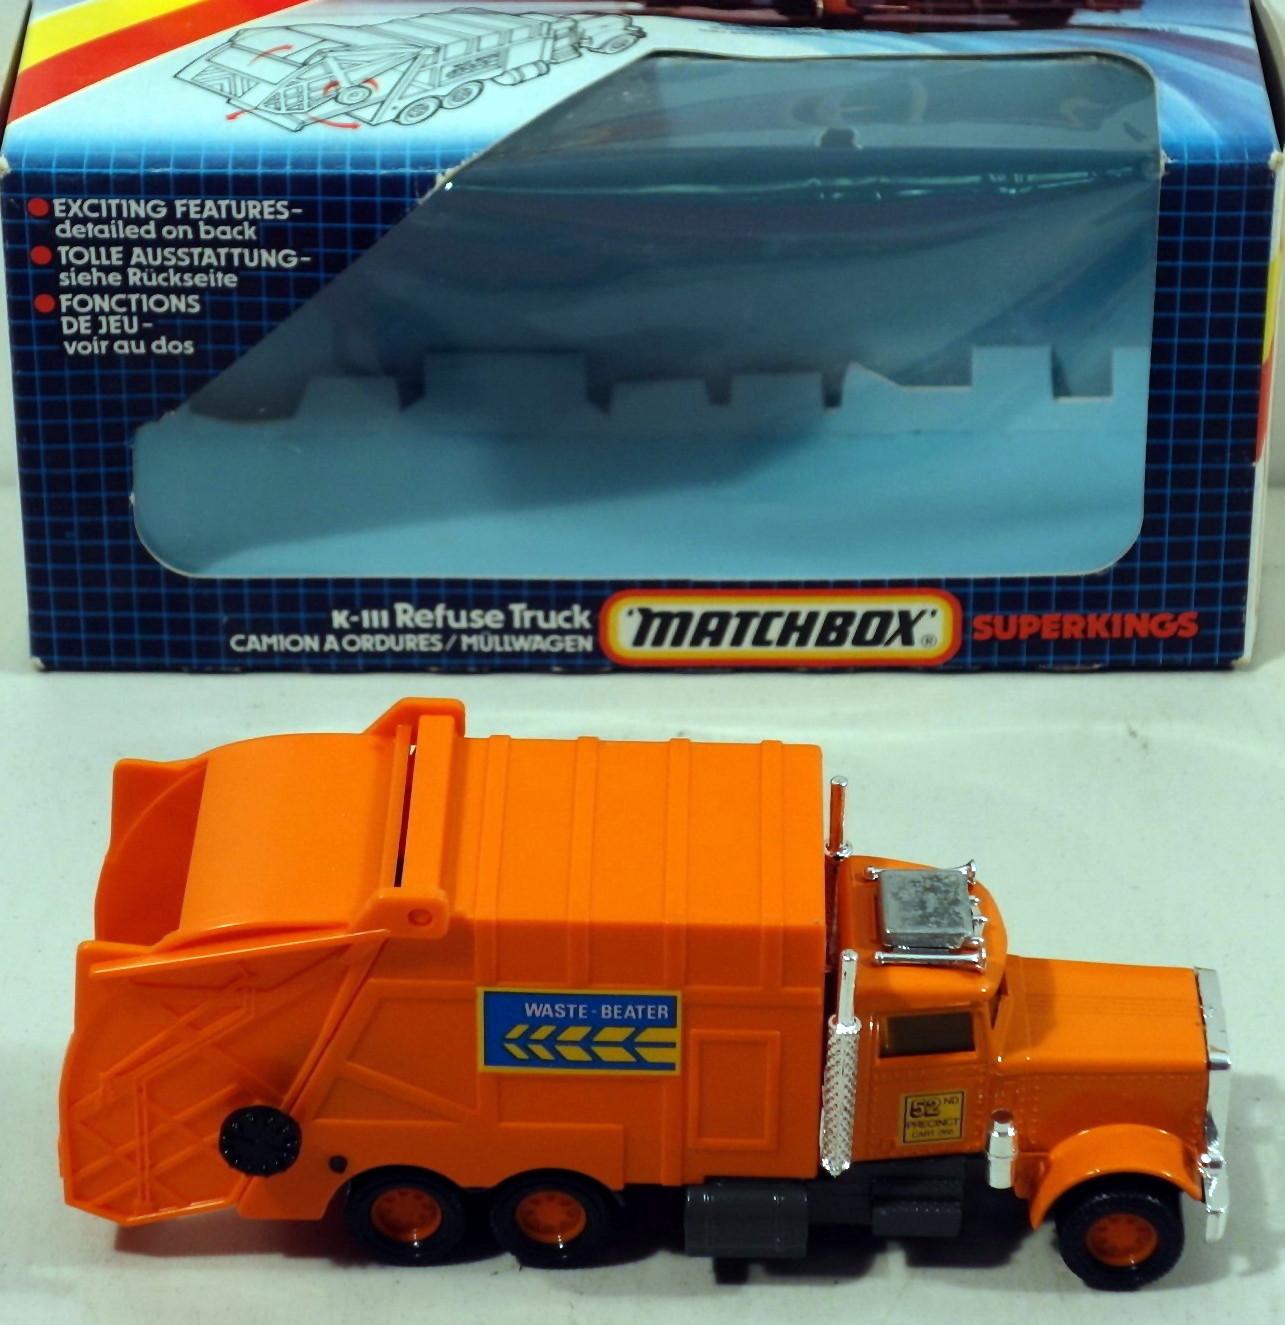 Refuse Truck Peterbilt (K-111)